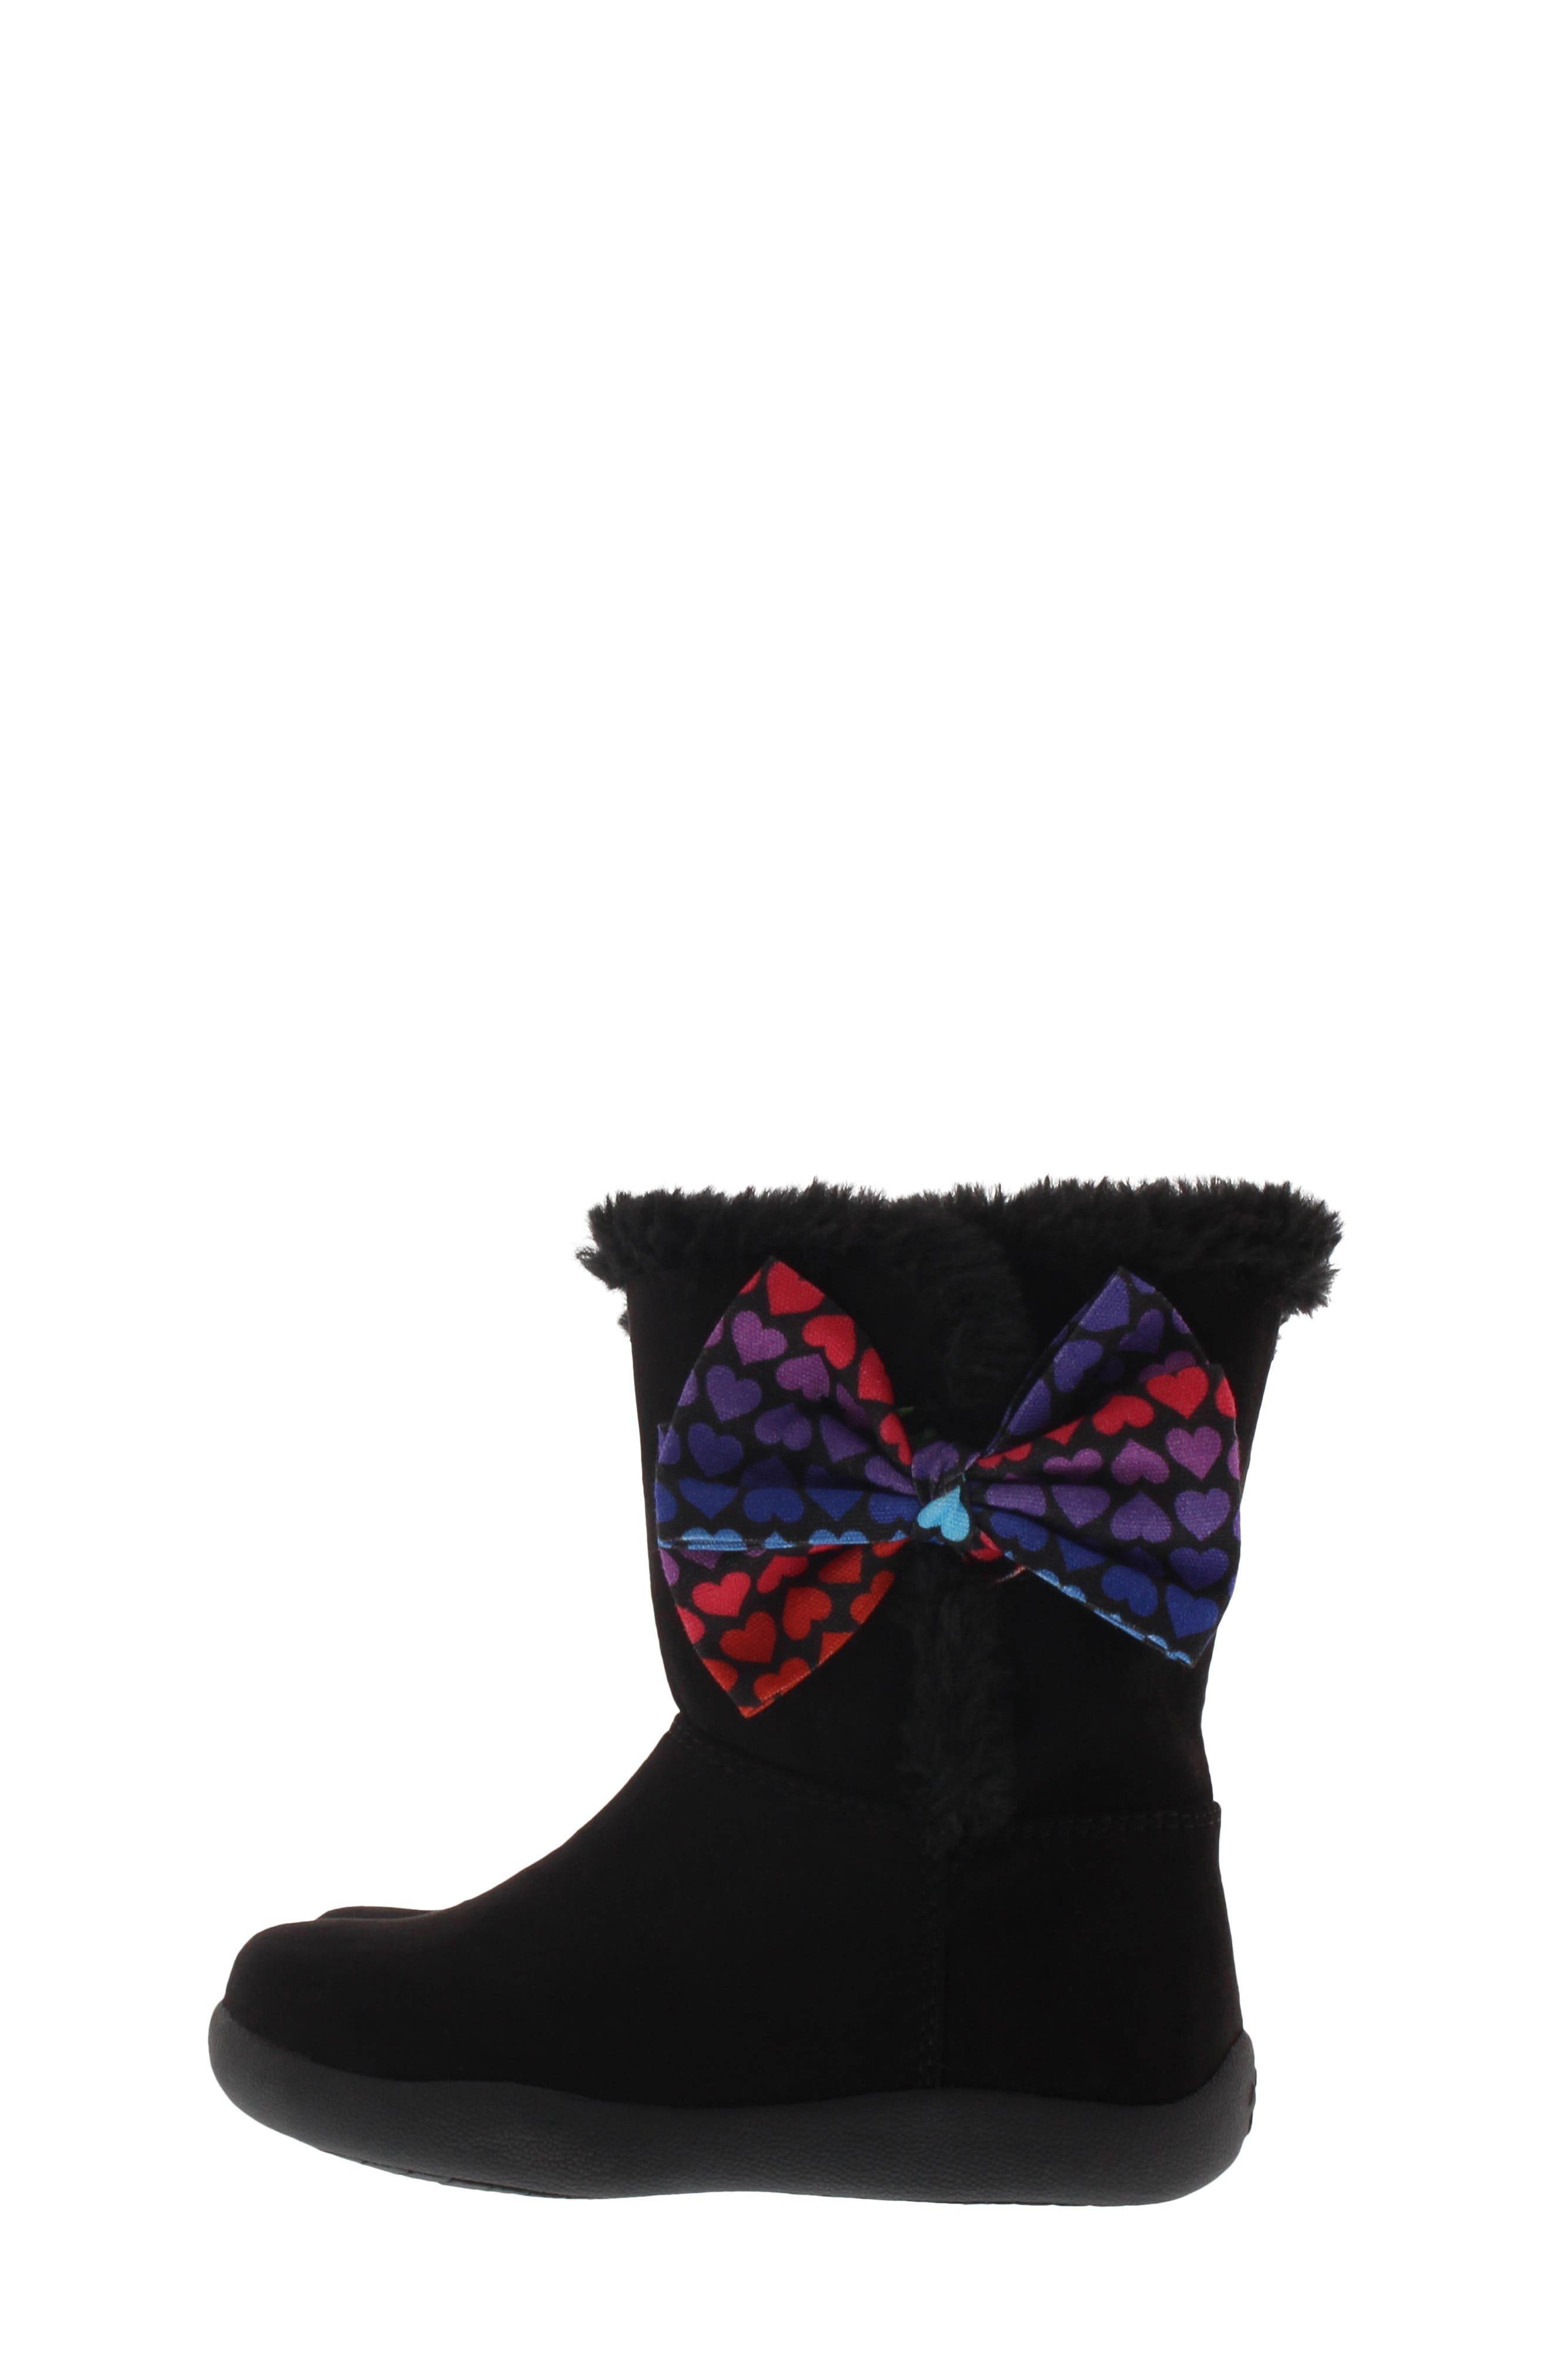 CHOOZE, Wish Faux Fur Lined Boot, Alternate thumbnail 7, color, BLACK